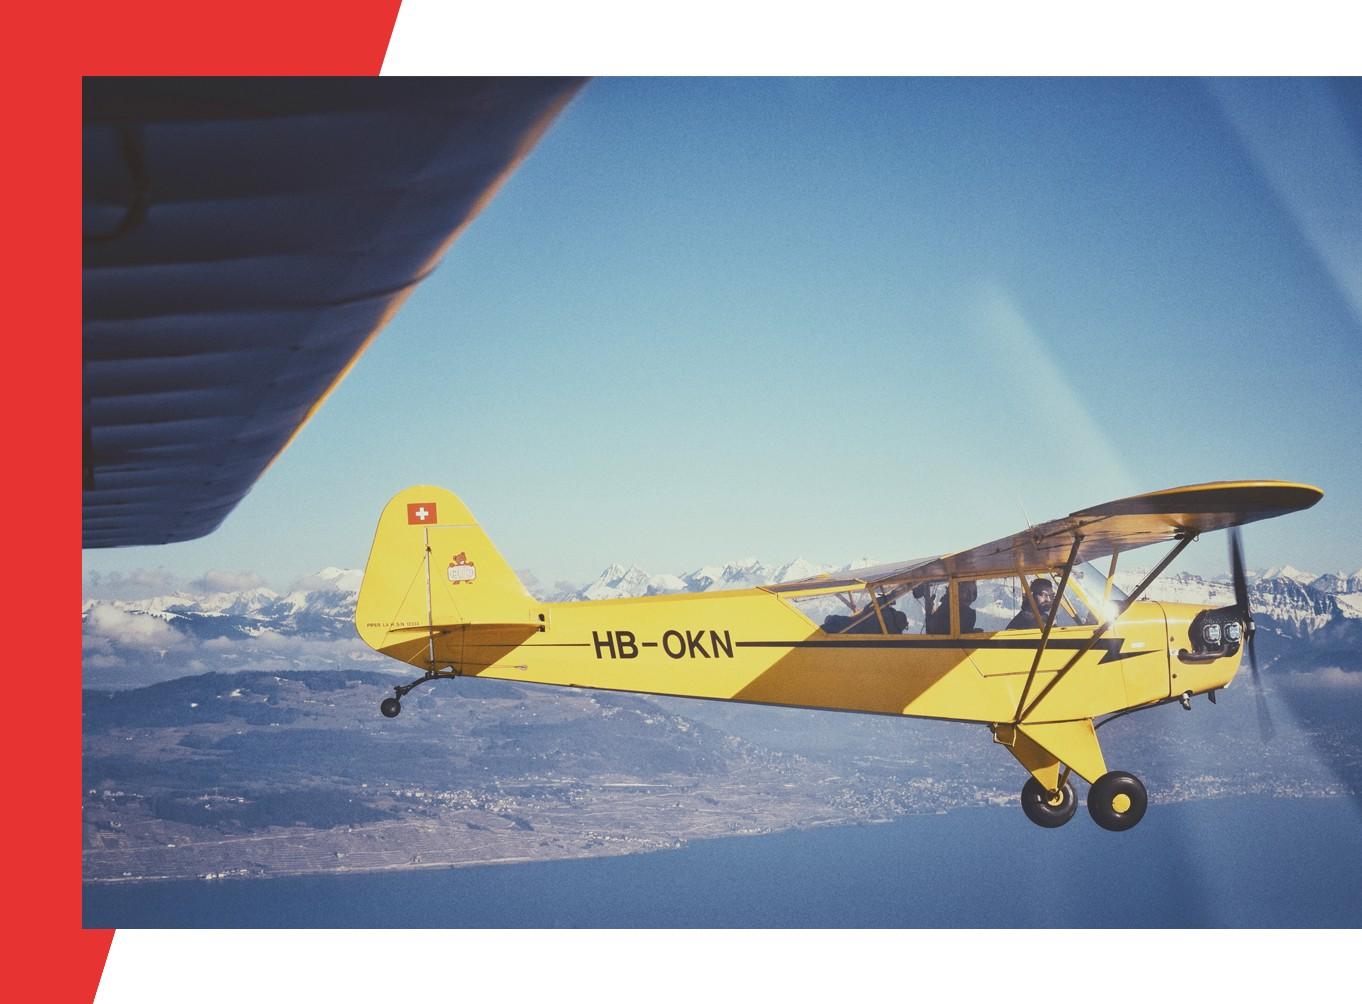 https://www.lausanne-aeroclub.ch/wp-content/uploads/2019/10/plane_L4.jpg